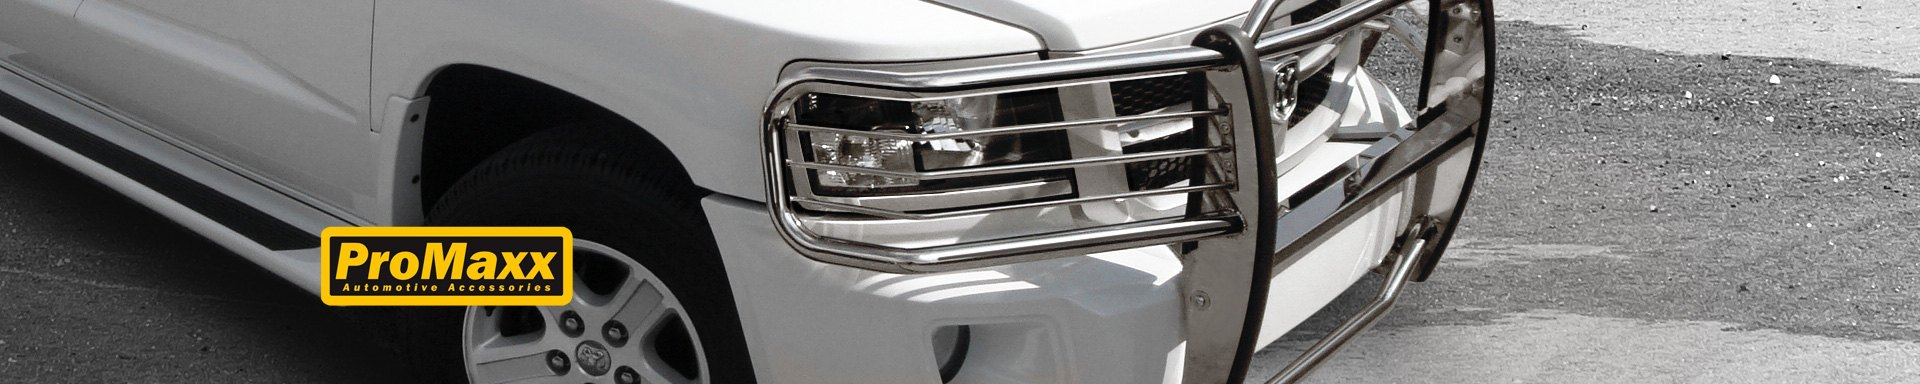 ProMaxx Automotive™ | Nerf Bars, Tool Boxes, Truck Parts